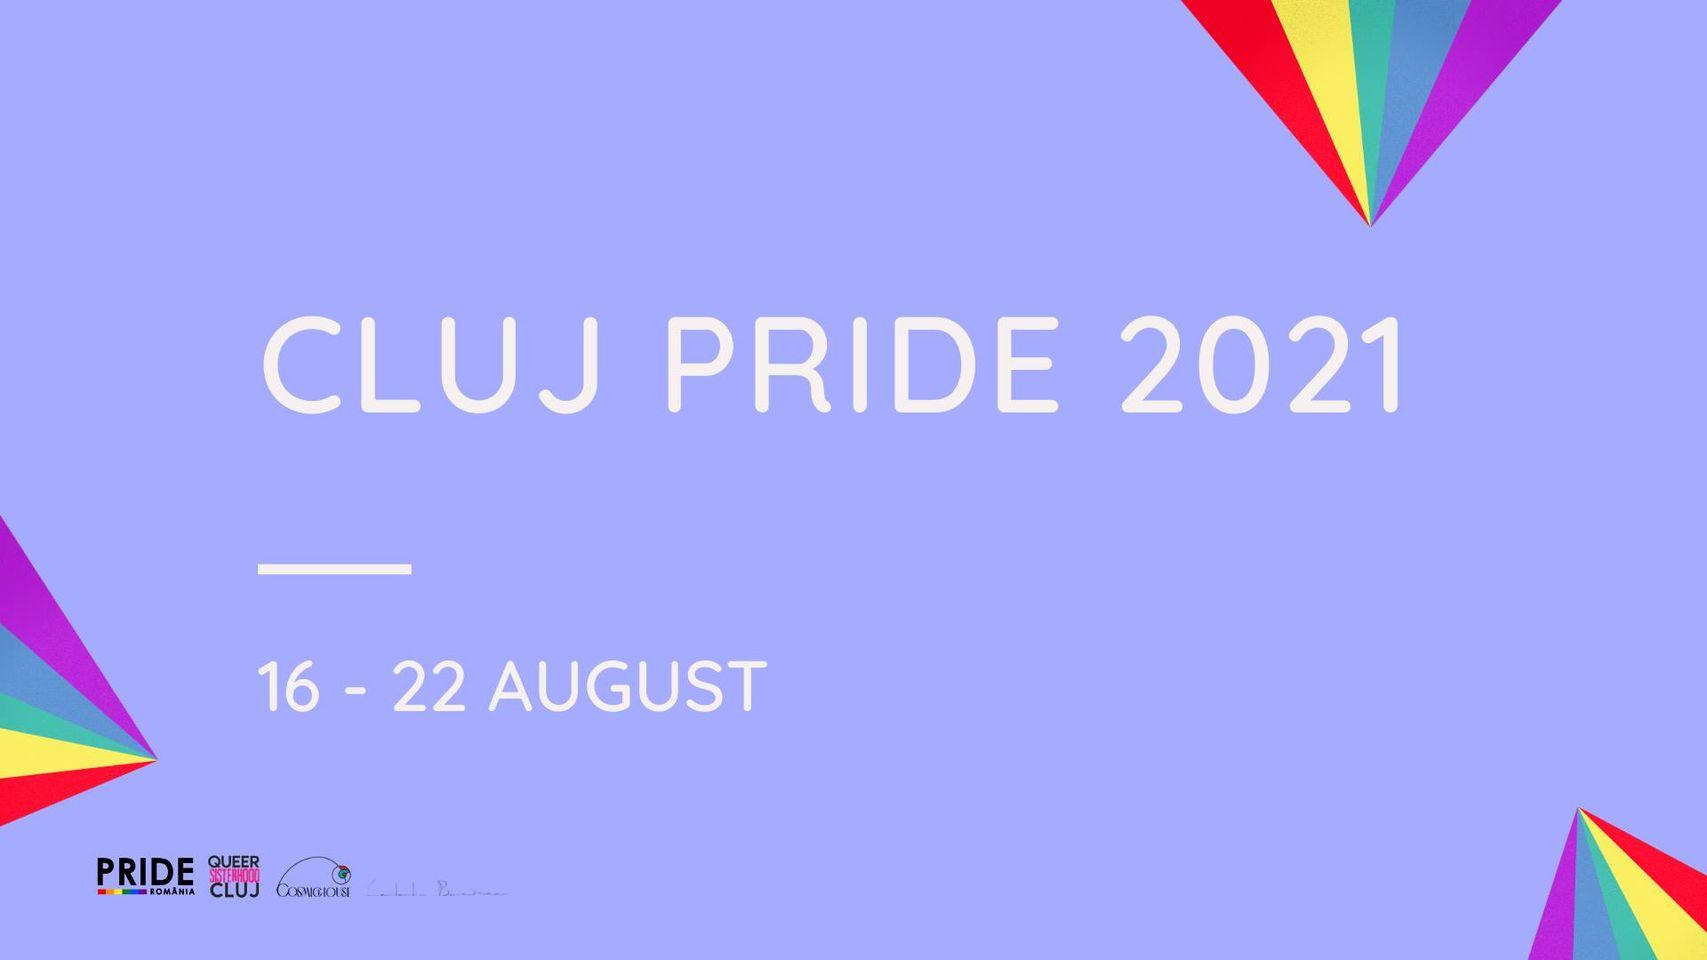 Cluj Pride 2021